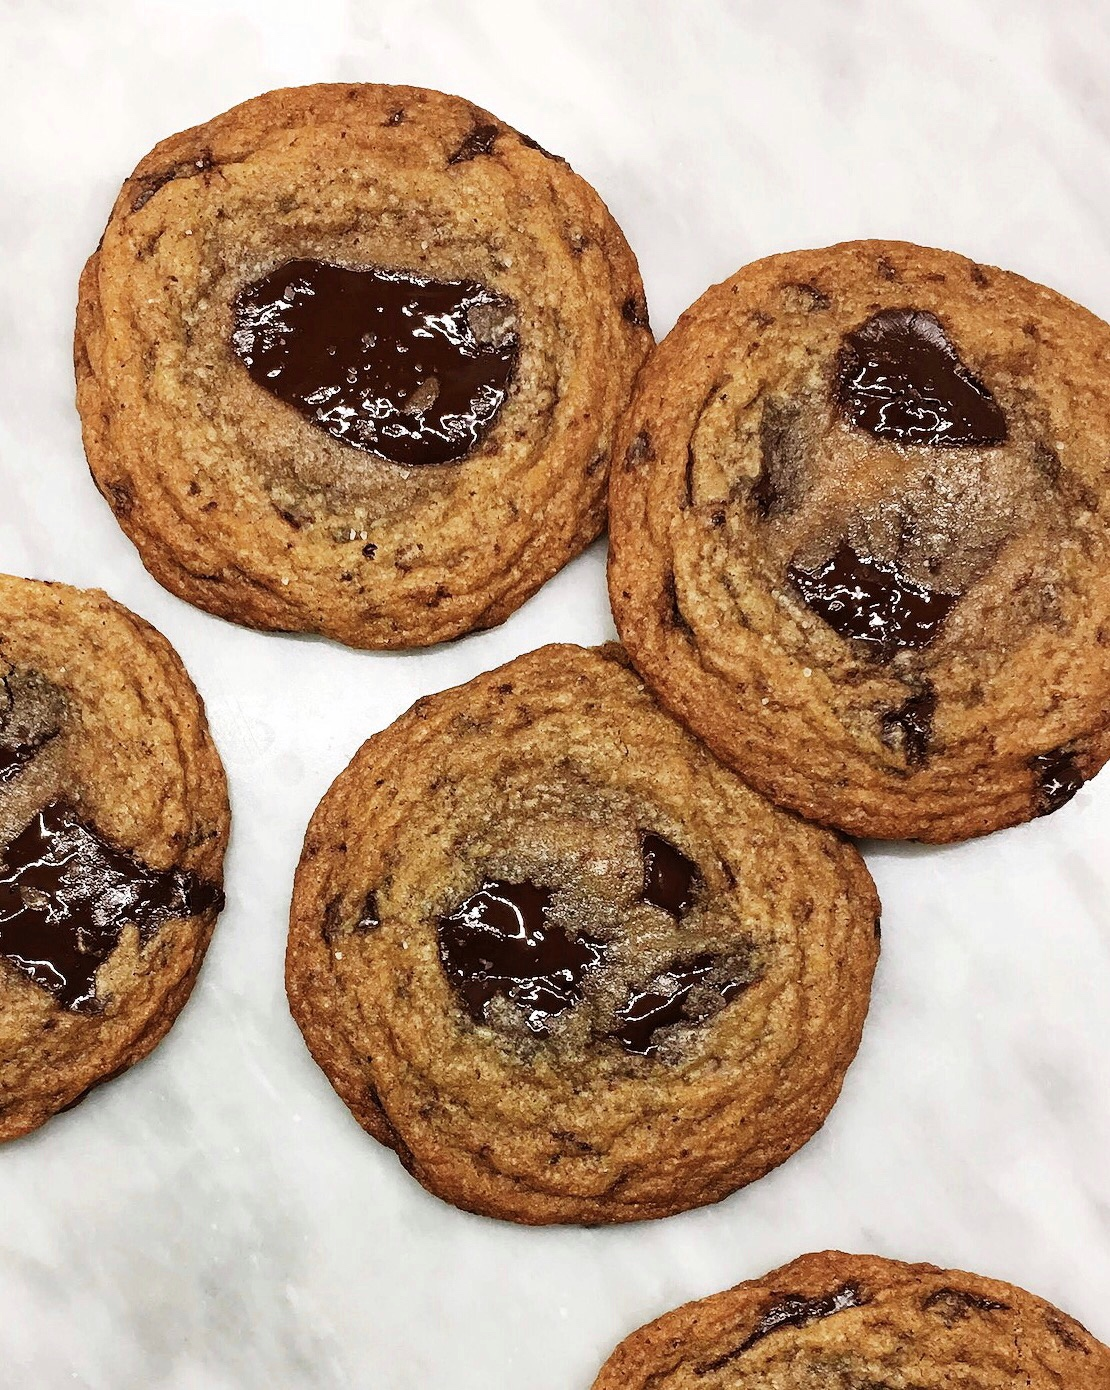 Les meilleurs biscuits